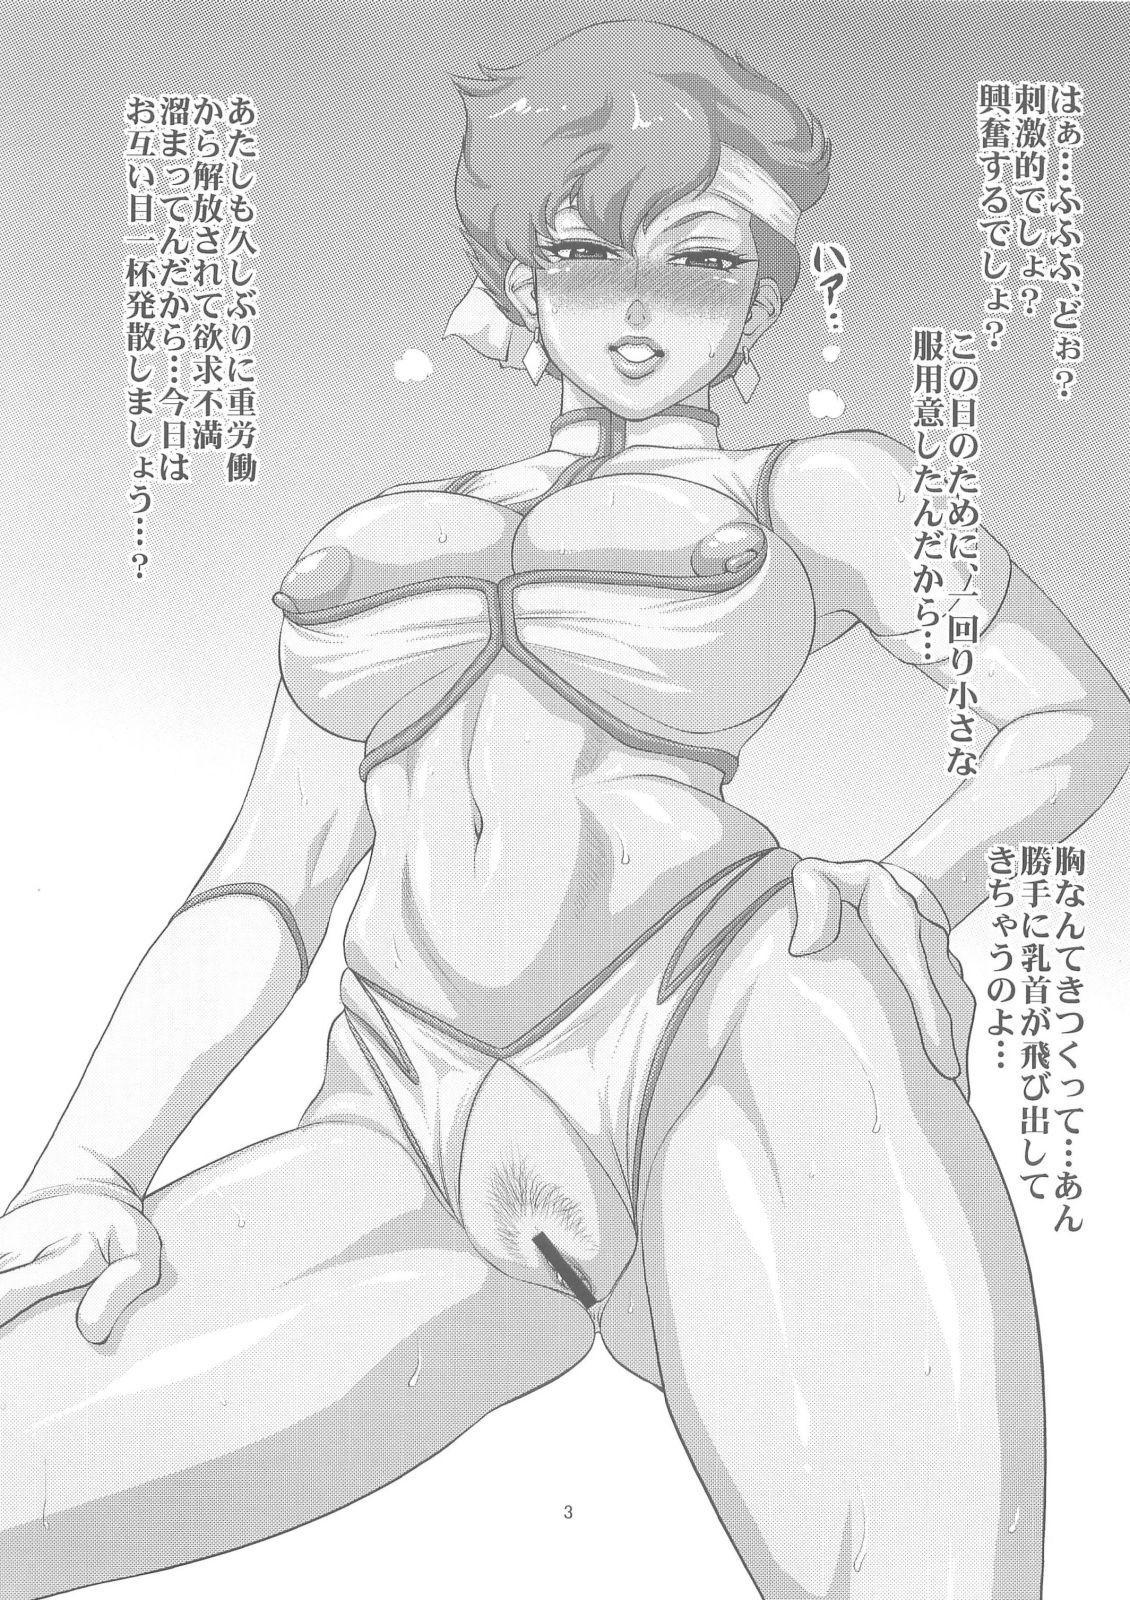 (C83) [Kikumizuan (Kikumizu Shouichi)] Lovely Erotics ~ K*i no Baai ~   Lovely Erotics -The Case of K*i- (Dirty Pair) 4